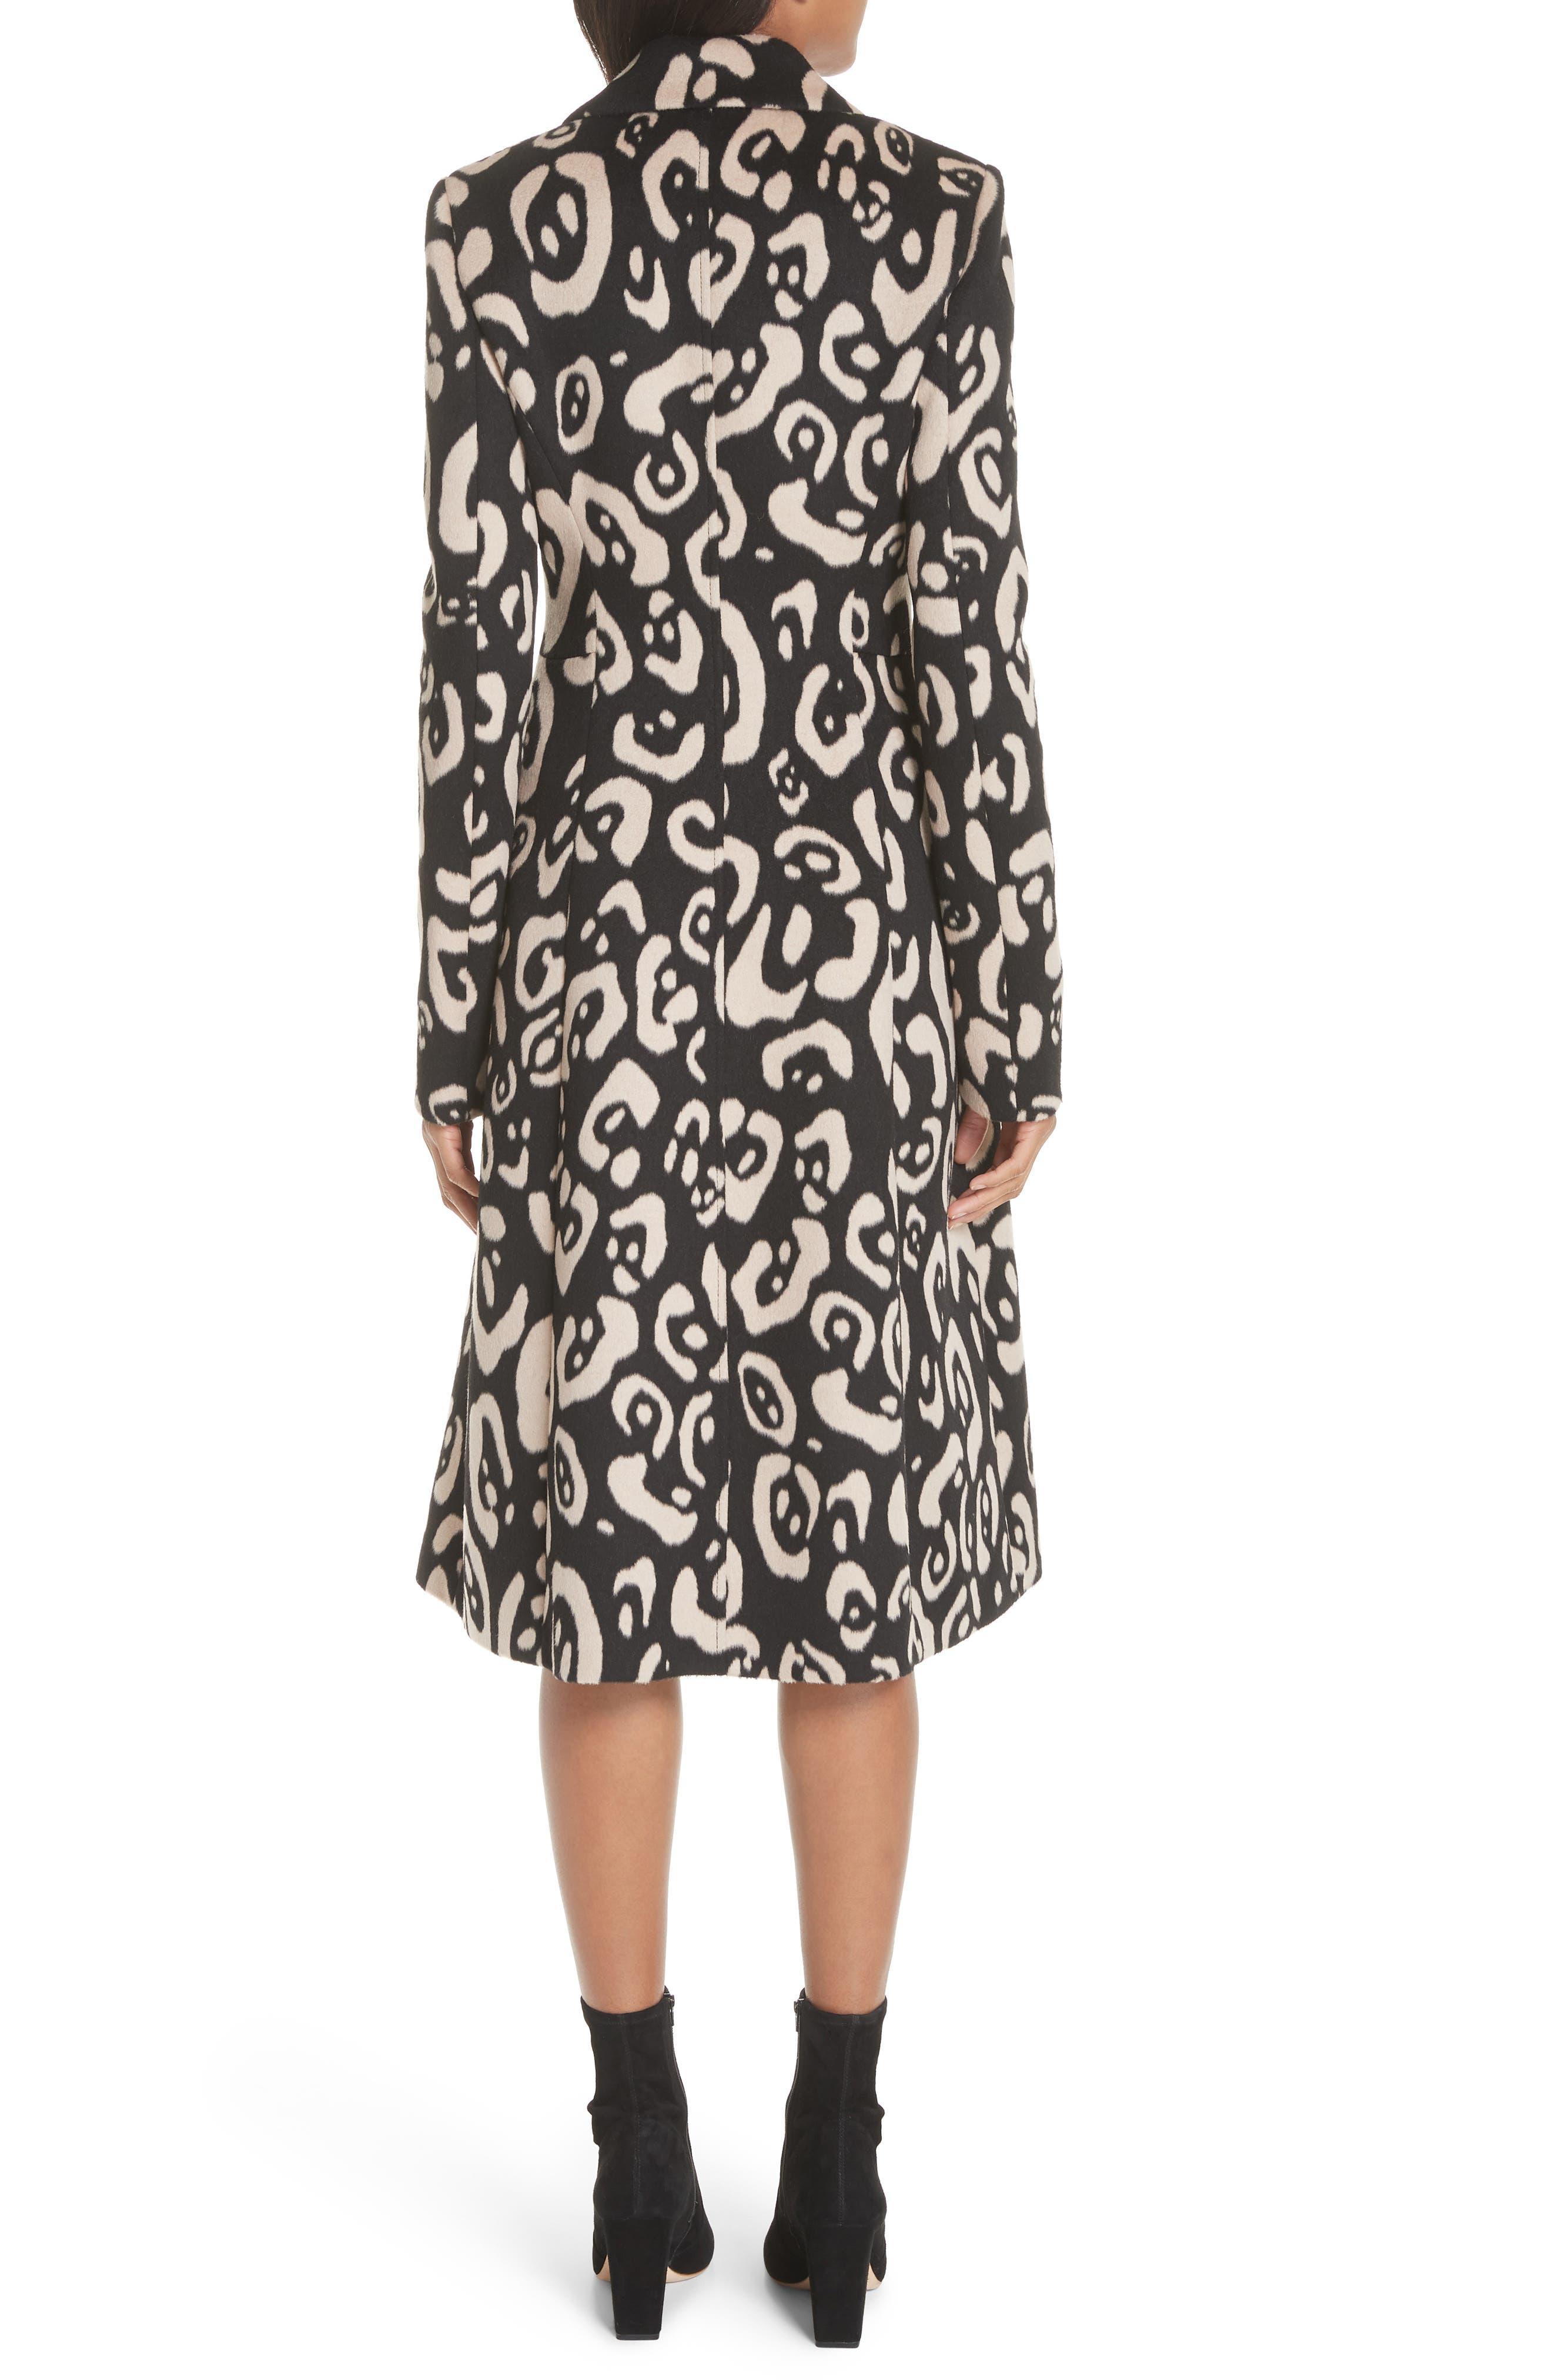 Driss Leopard Print Wool Blend Coat,                             Main thumbnail 1, color,                             001